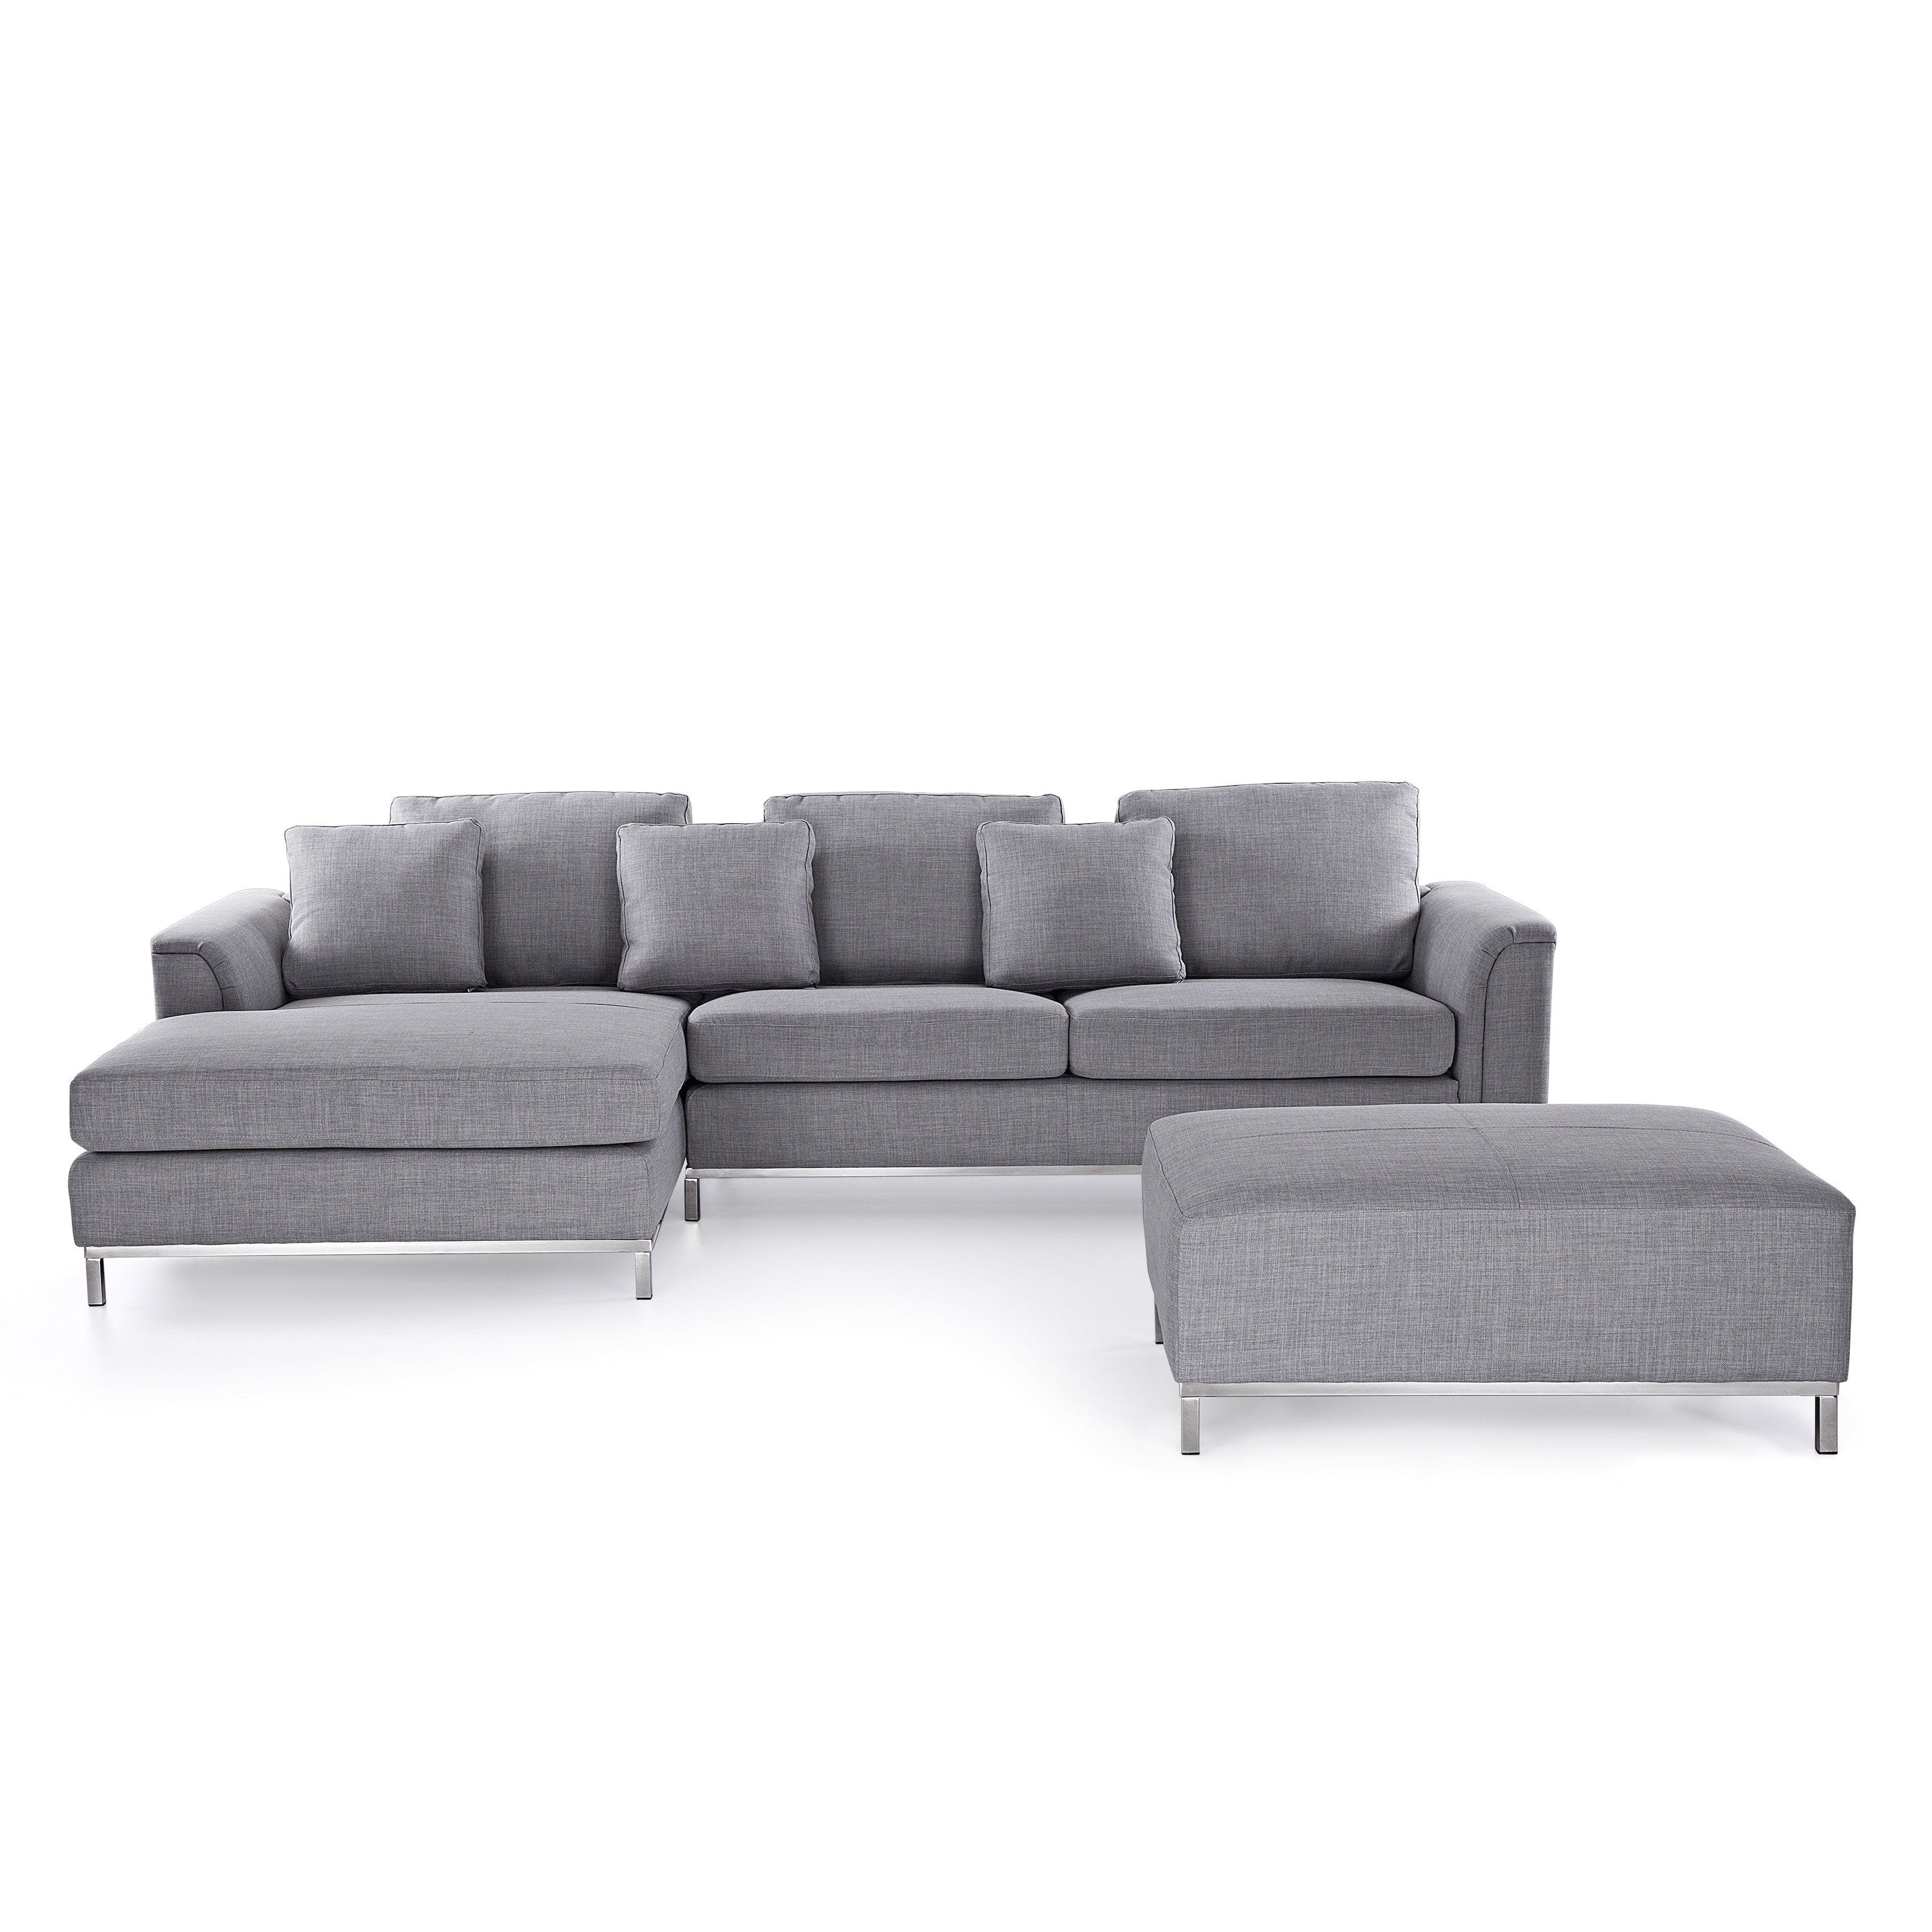 Beliani Oslo Modern Sectional Sofa with Ottoman Oslo Light Grey Polyester